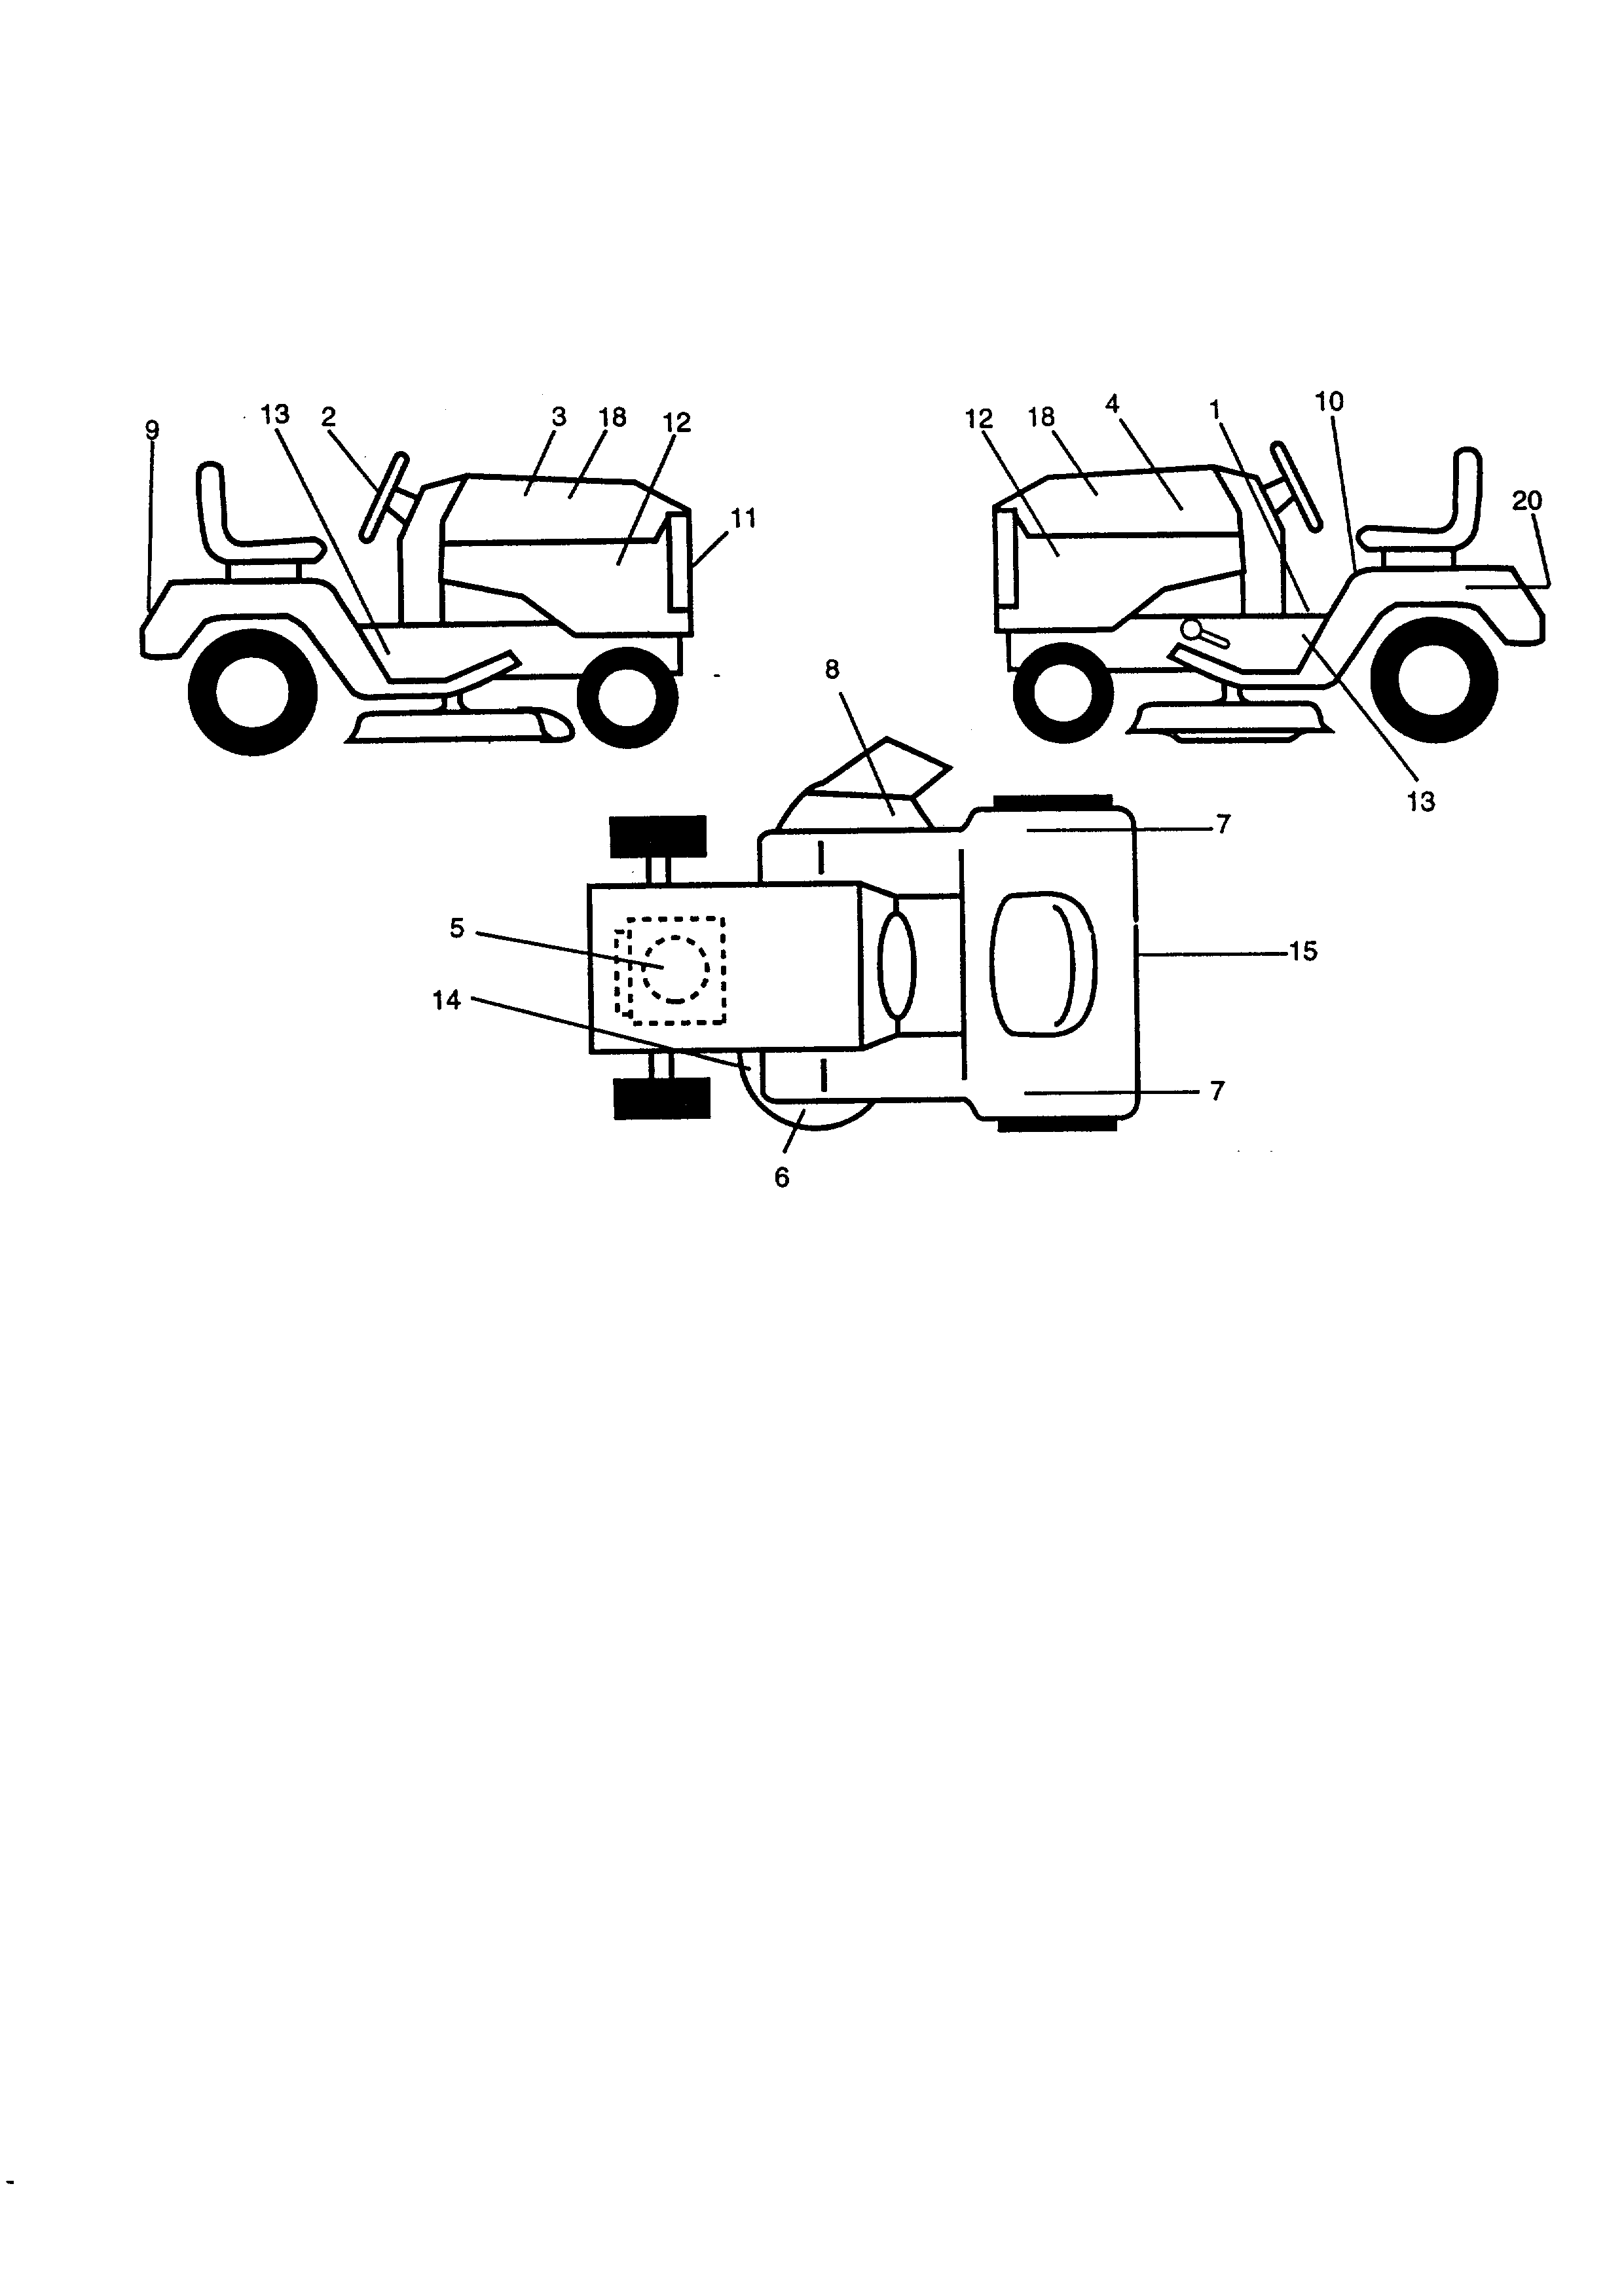 Western Auto Model Ayp9187b89 Lawn Tractor Genuine Parts Rims Single Element Wiring Diagram